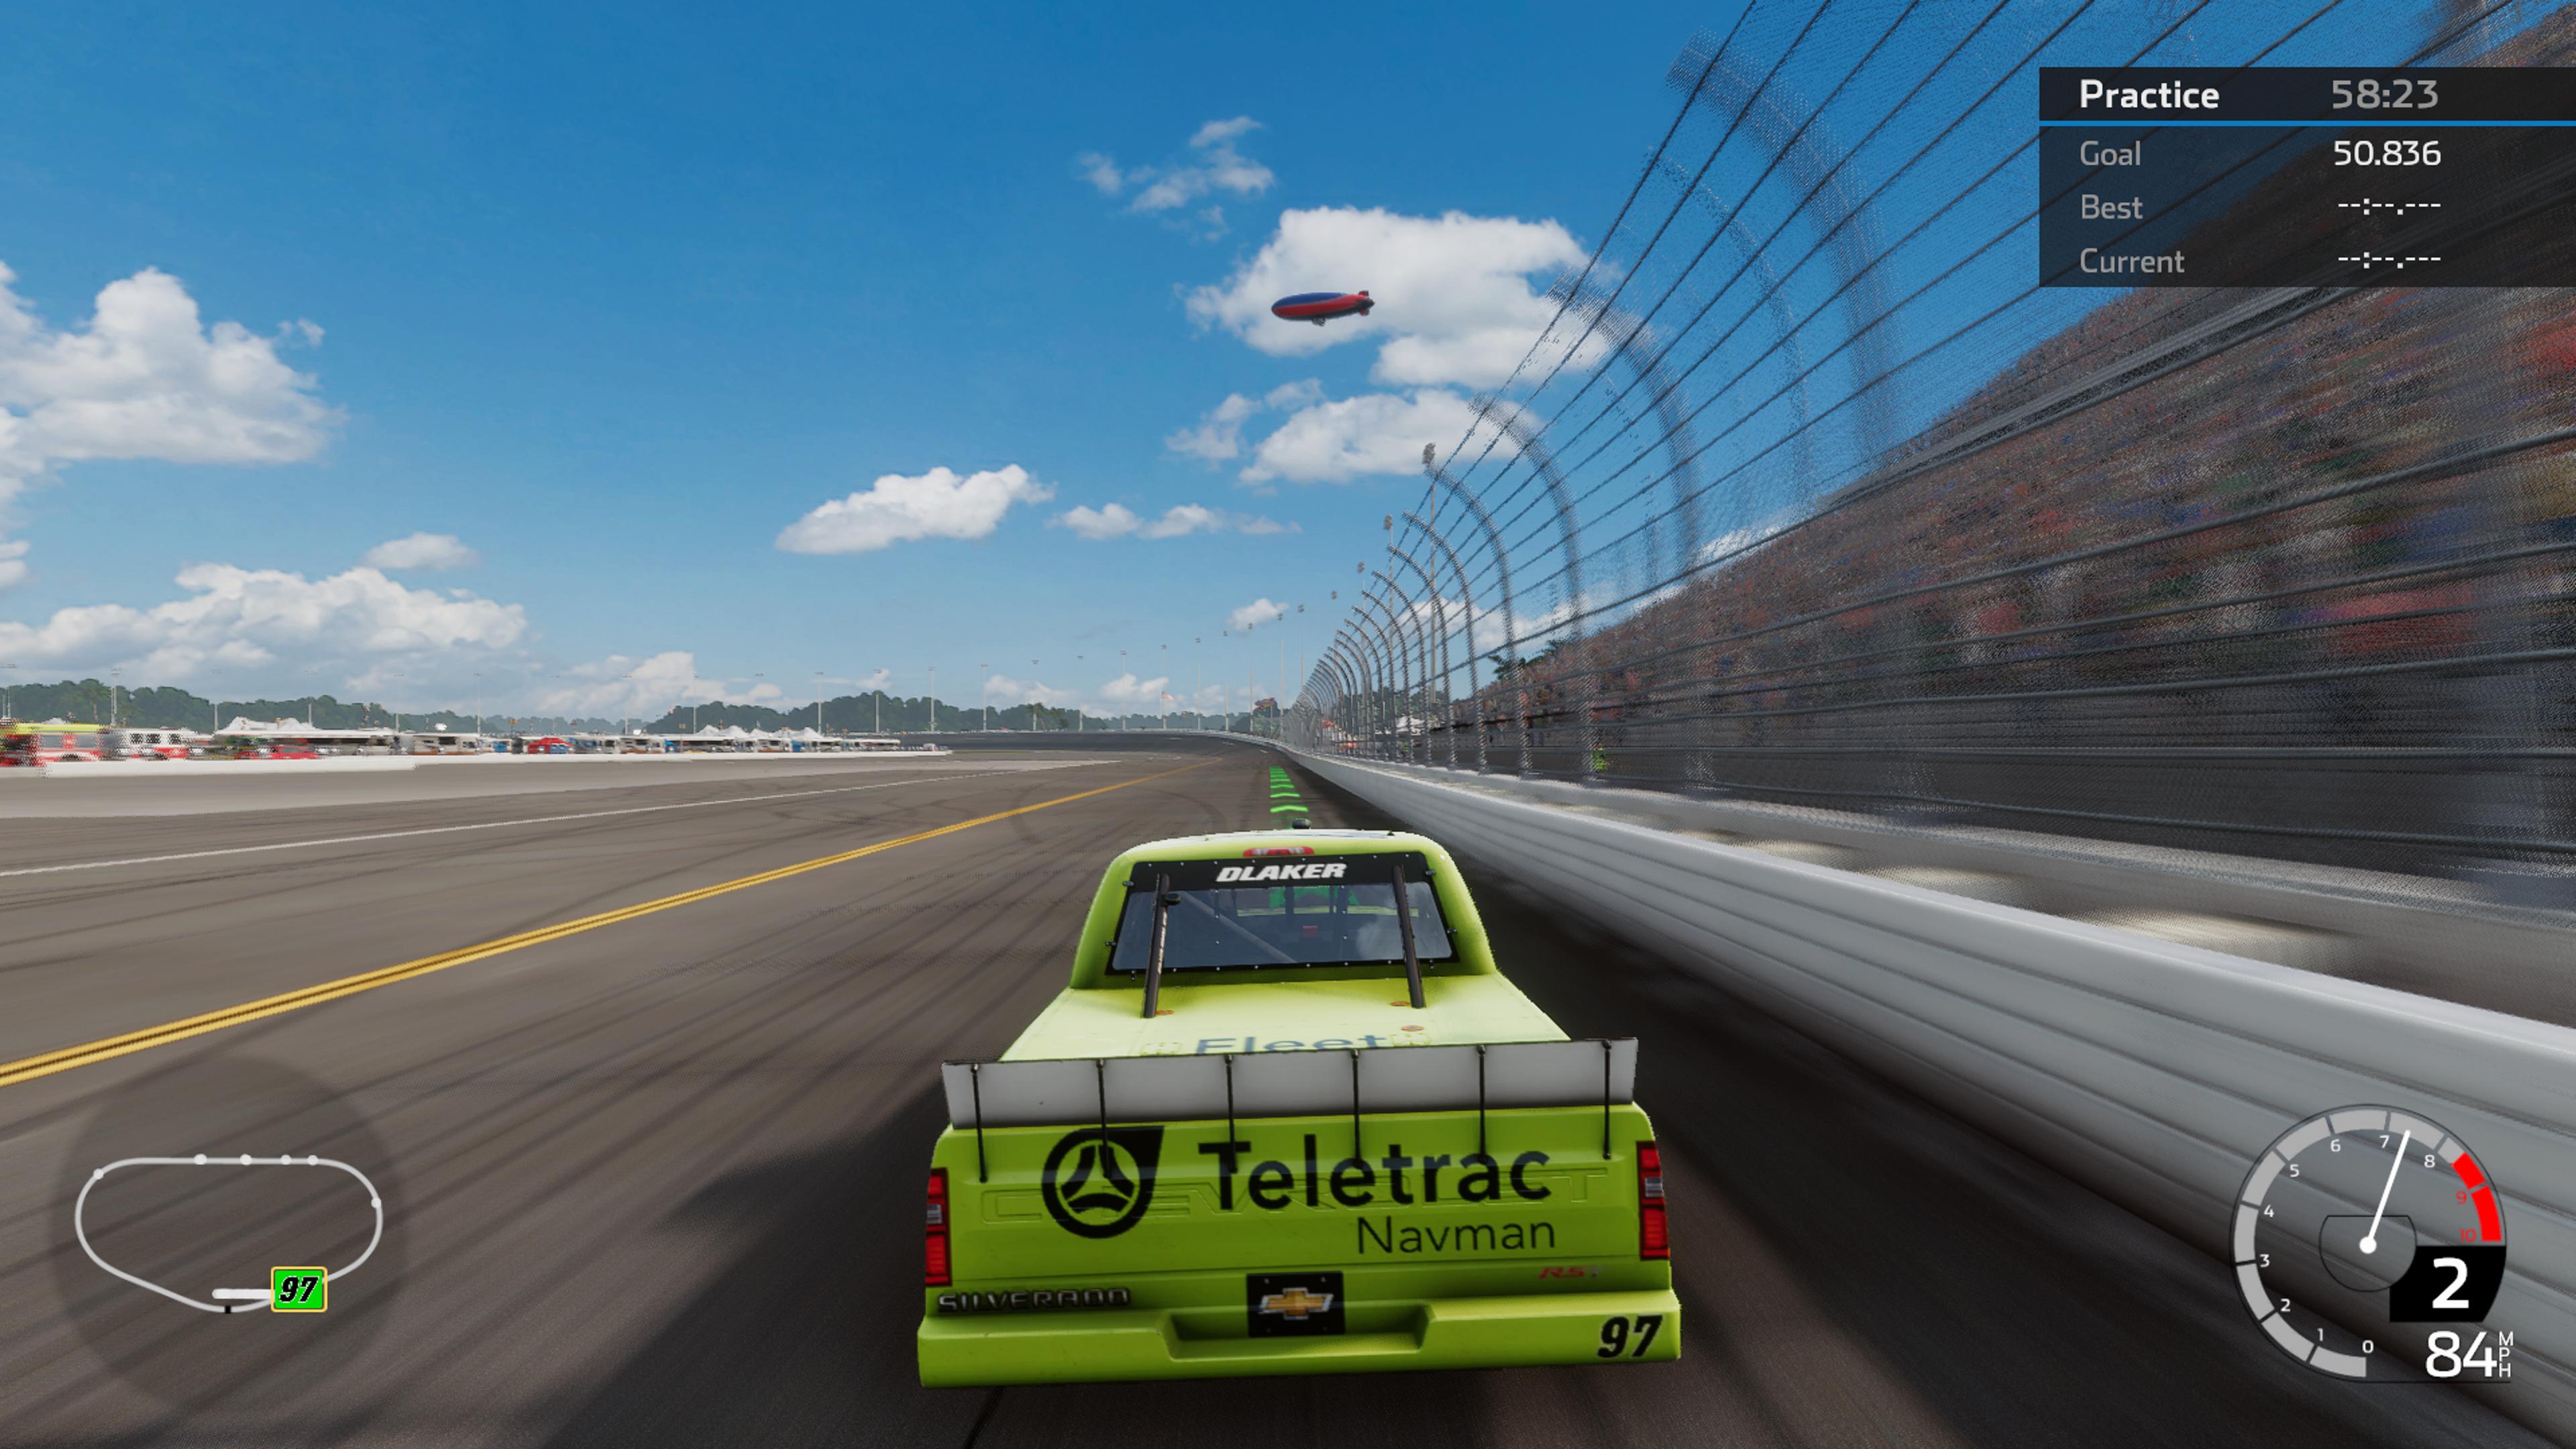 DaniloDlaker NASCARHeat5 20200713 18 44 29